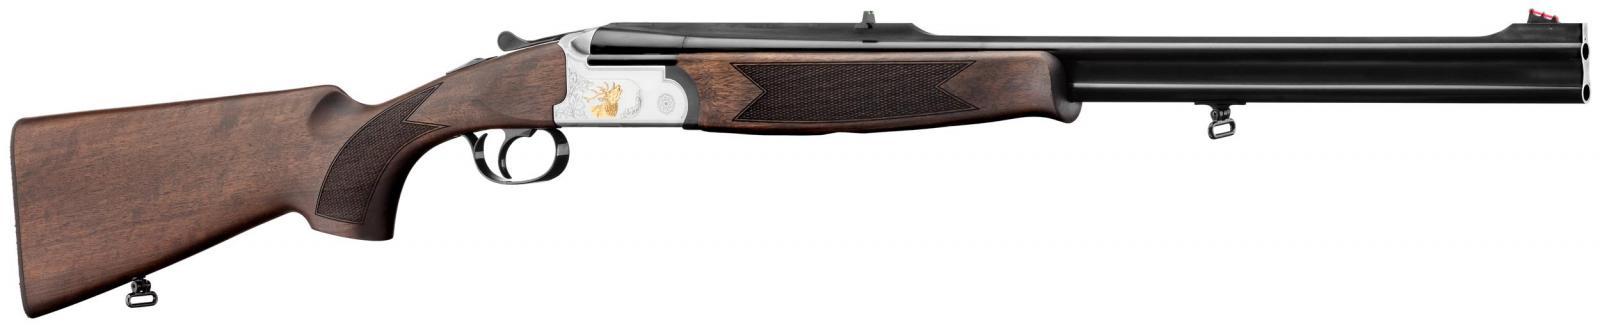 Carabine RENATO BALDI EXPRESS PREMIER Acier Cal 9,3x74R